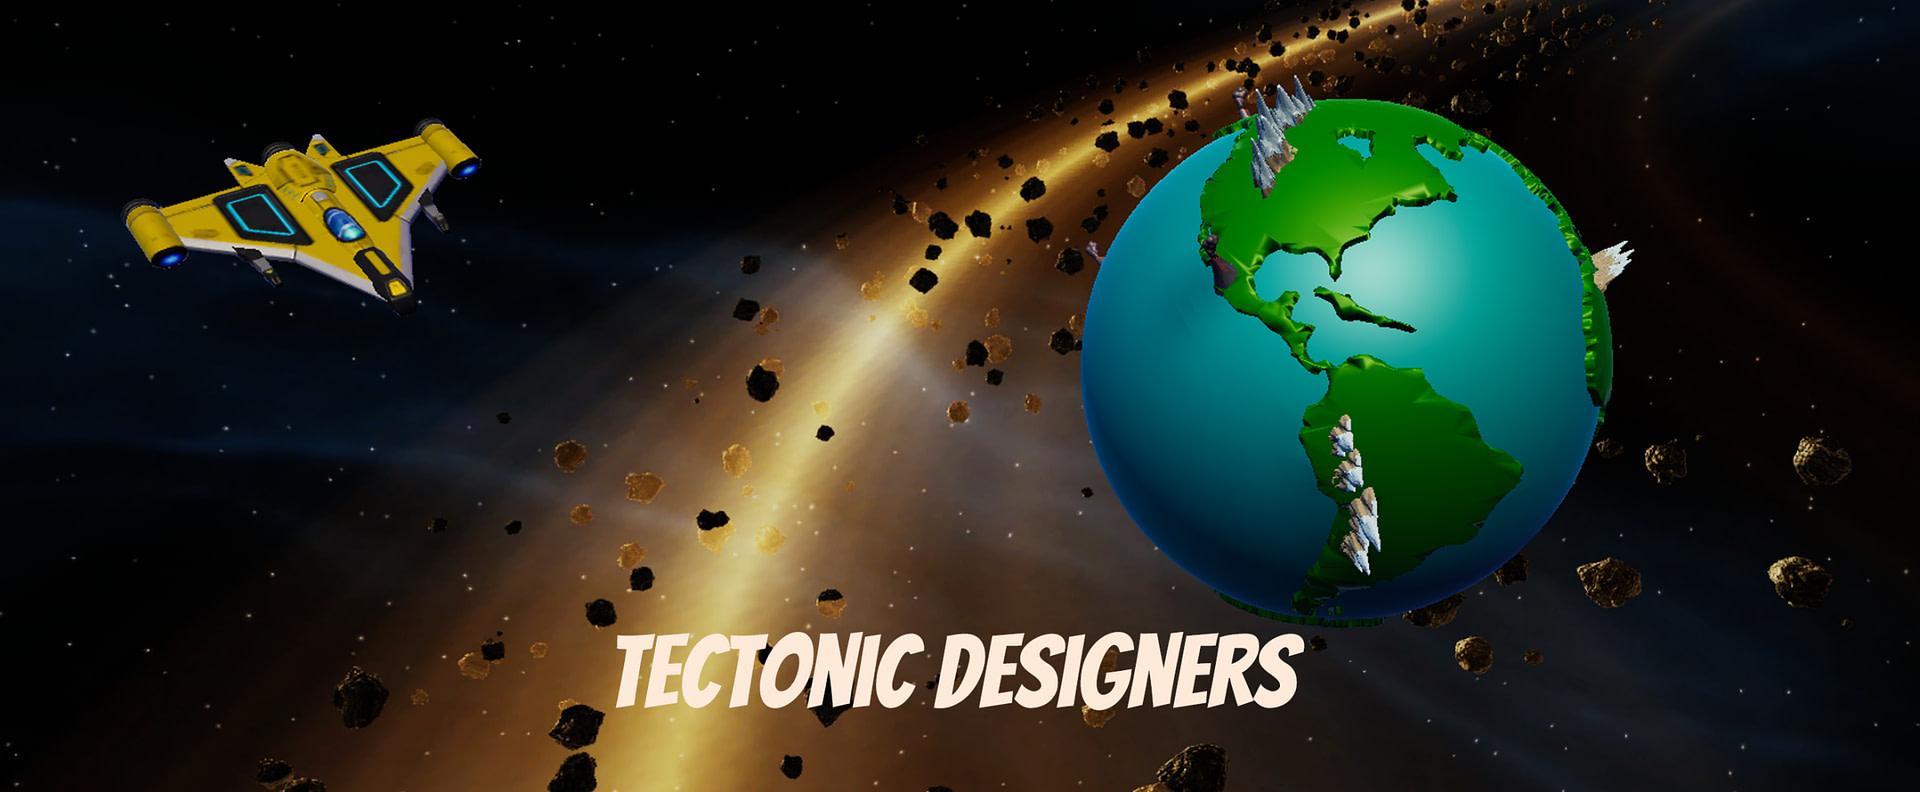 Tectonic Designers ART 2